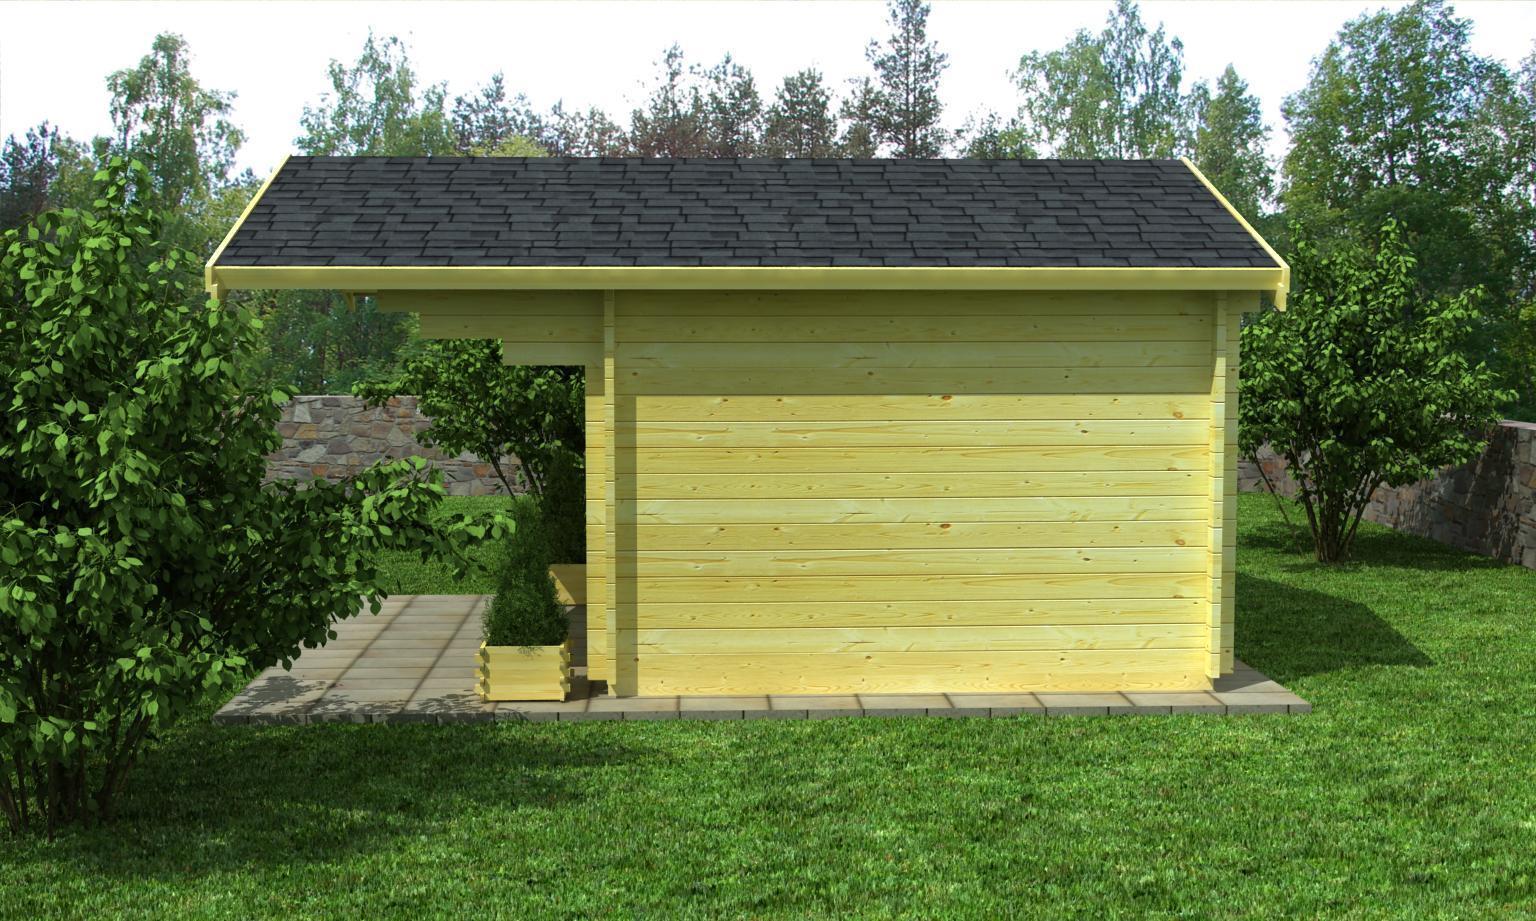 gartenhaus holz paderborn my blog. Black Bedroom Furniture Sets. Home Design Ideas